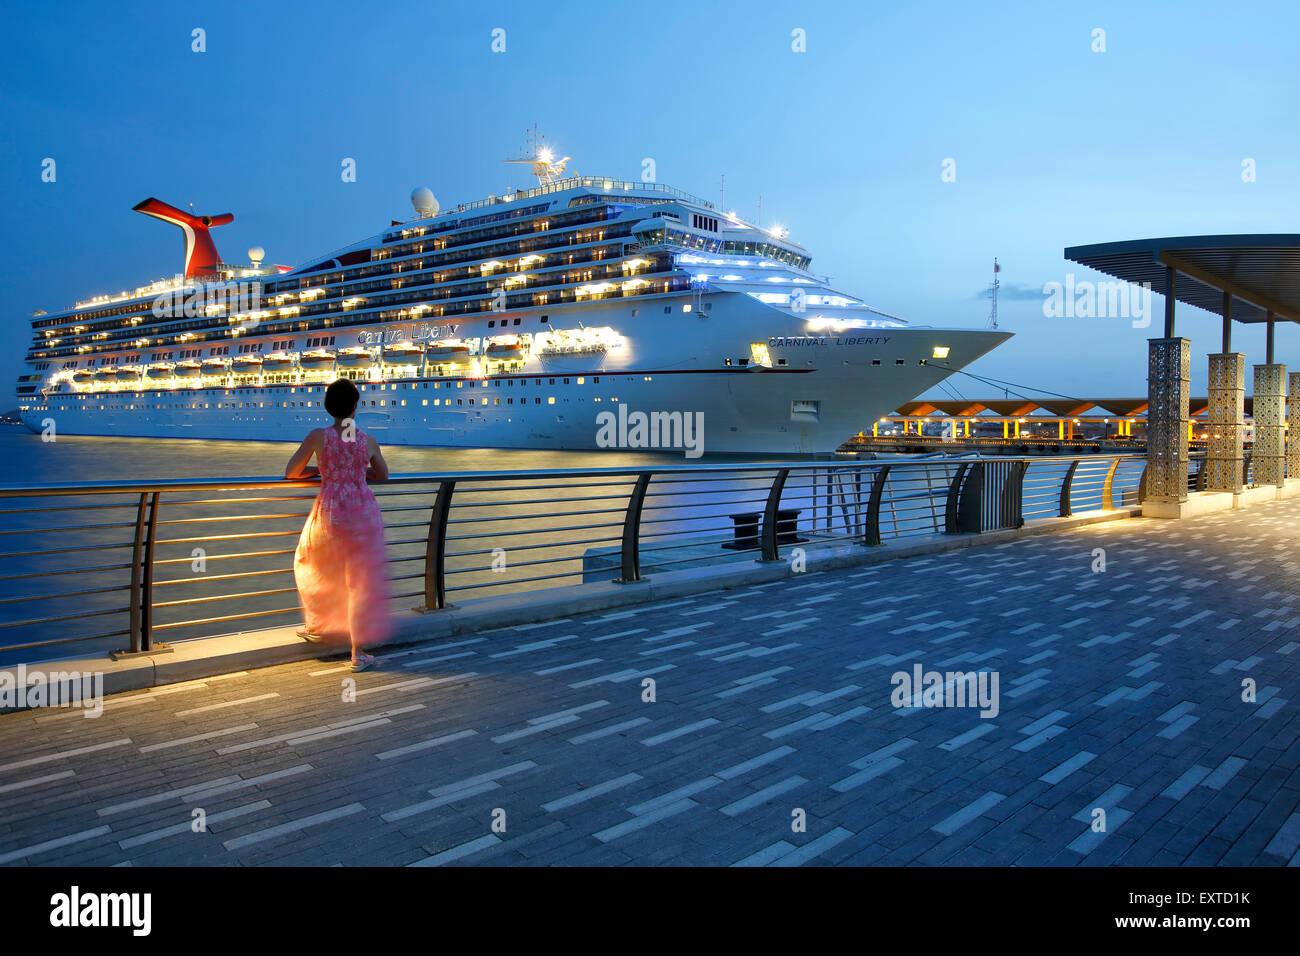 Woman admiring cruise ship from  Bahia Urbana (Urban Bay), Old San Juan, Puerto Rico - Stock Image